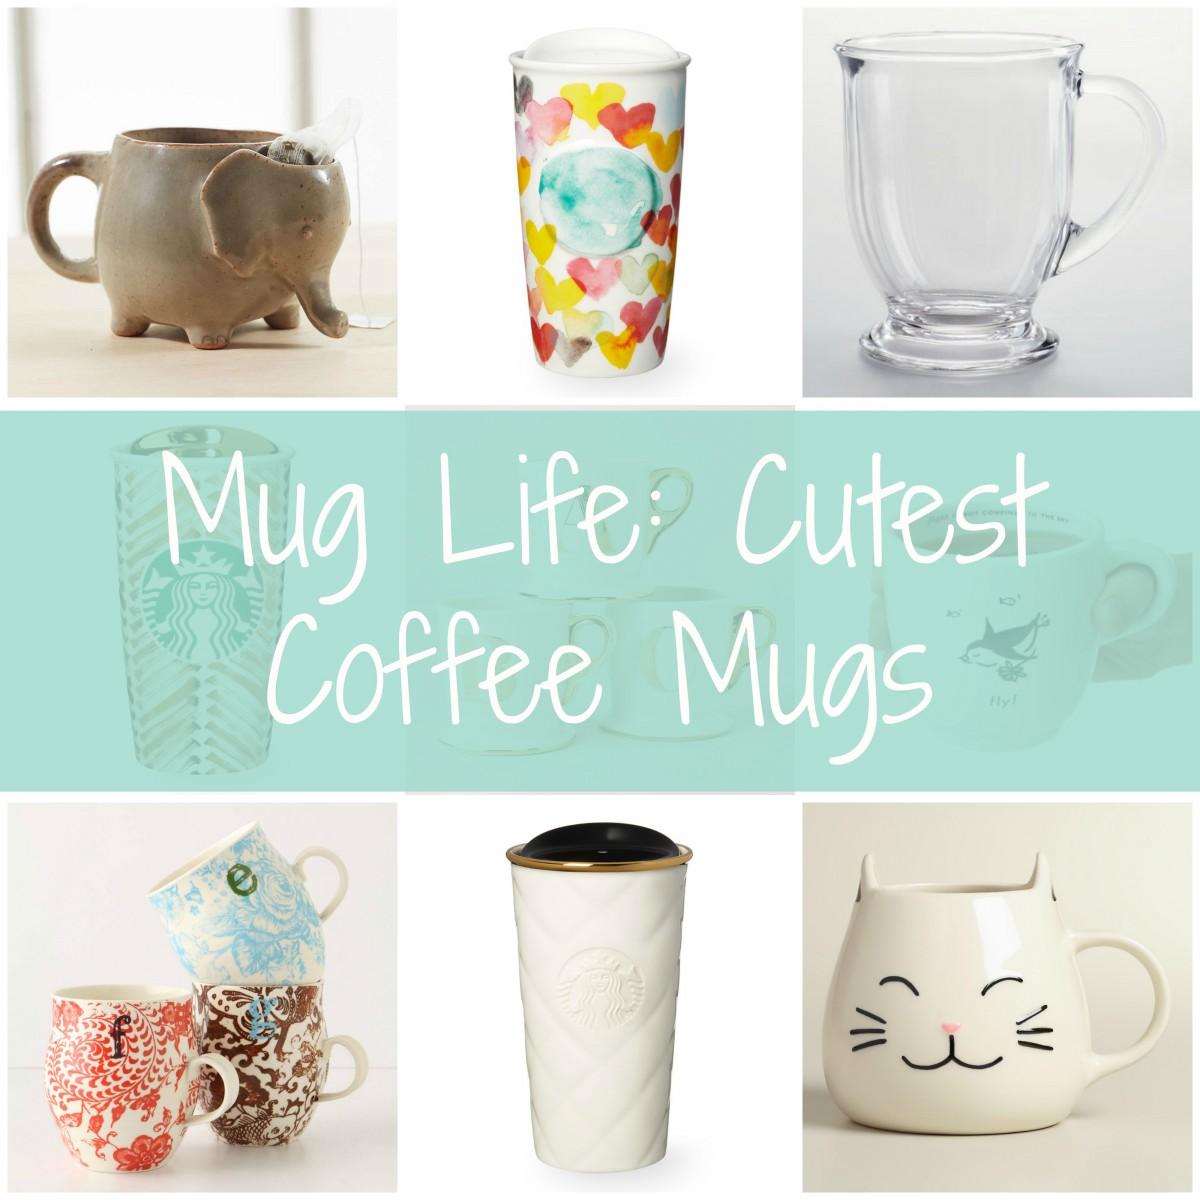 Mug Life Cutest Coffee Mugs Her Heartland Soul